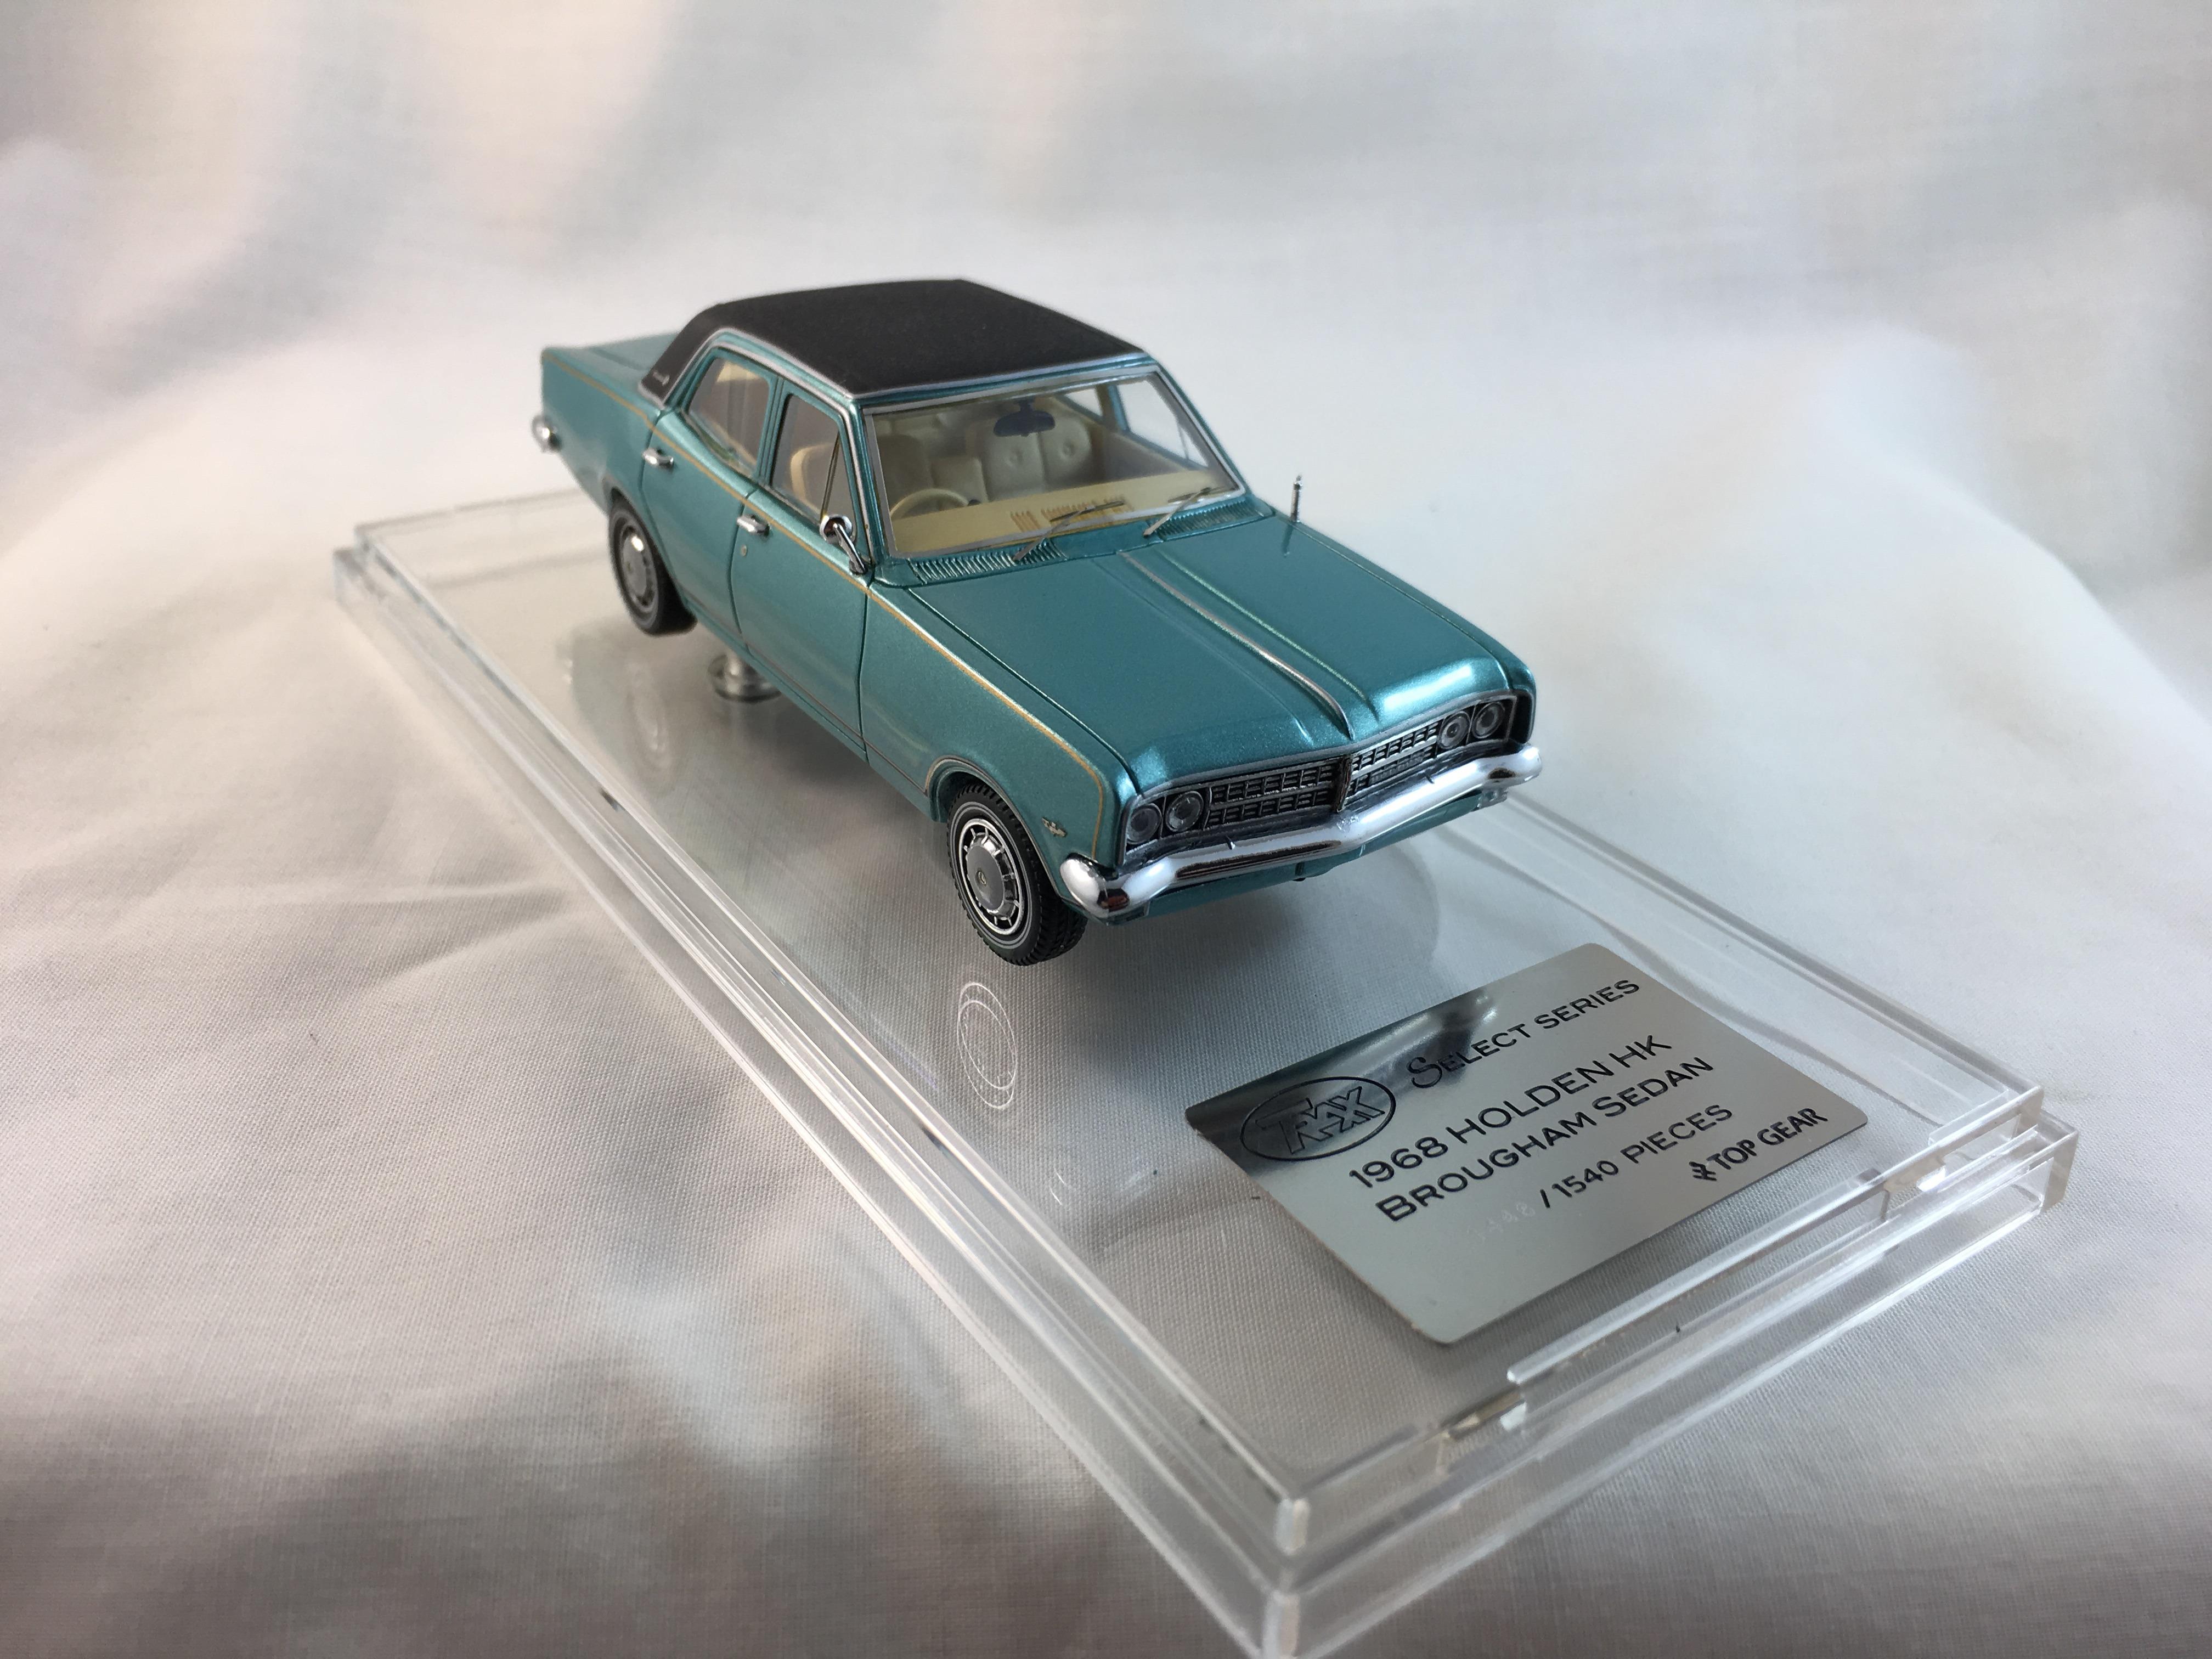 1968 HK Brougham Sedan